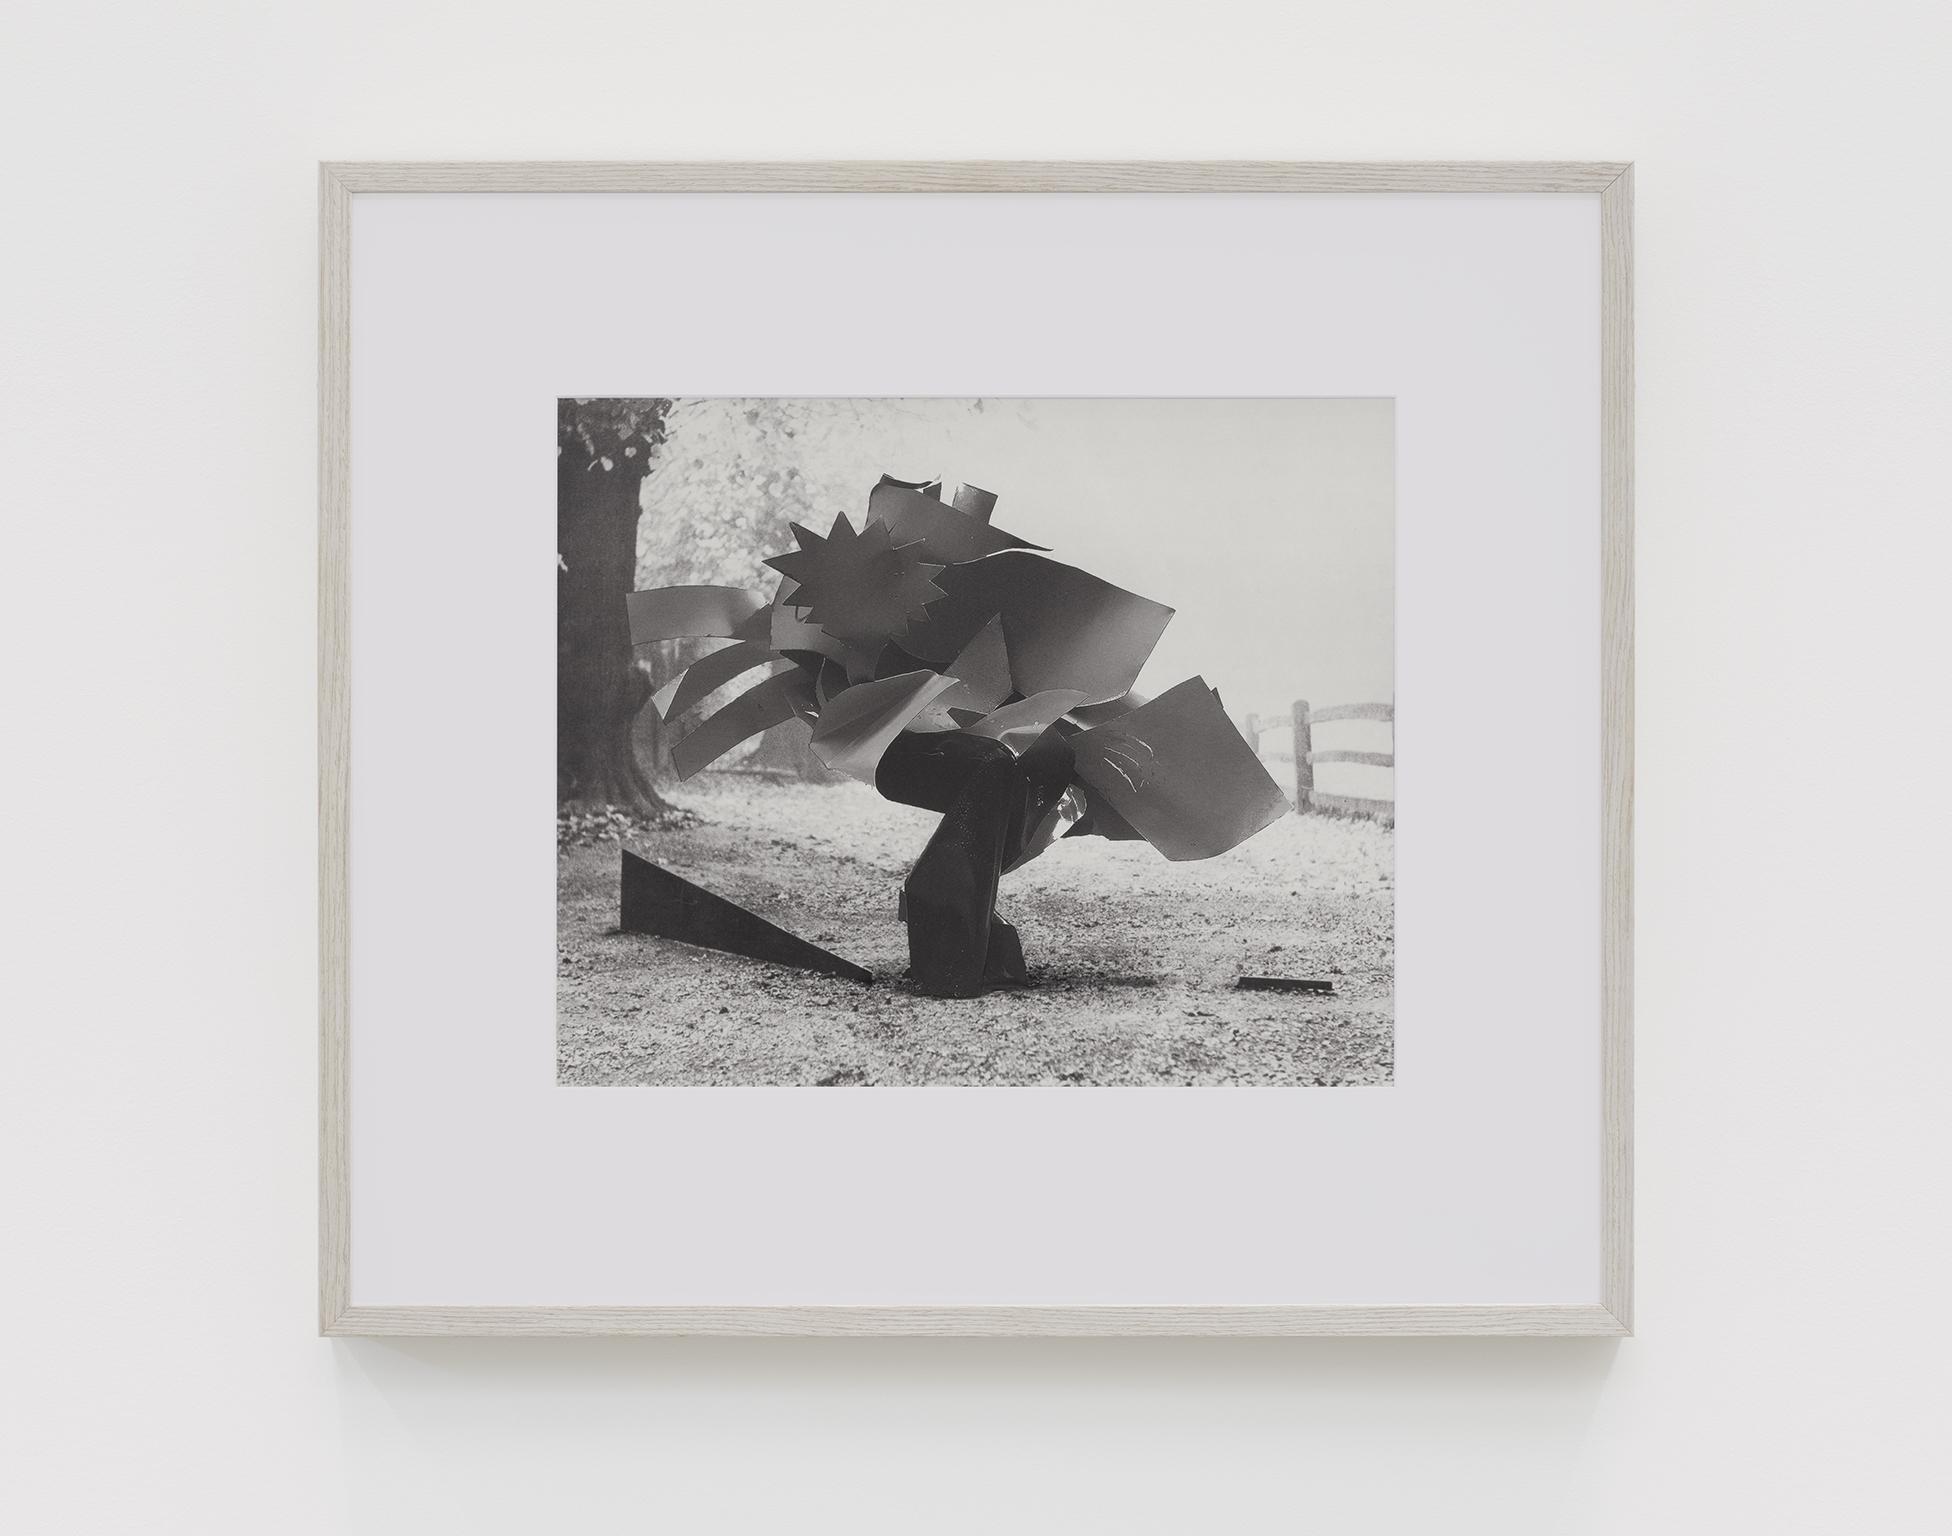 Damian Moppett, Over Caro, 2019, inkjet print, 23 x 25 in. (57 x 63 cm) by